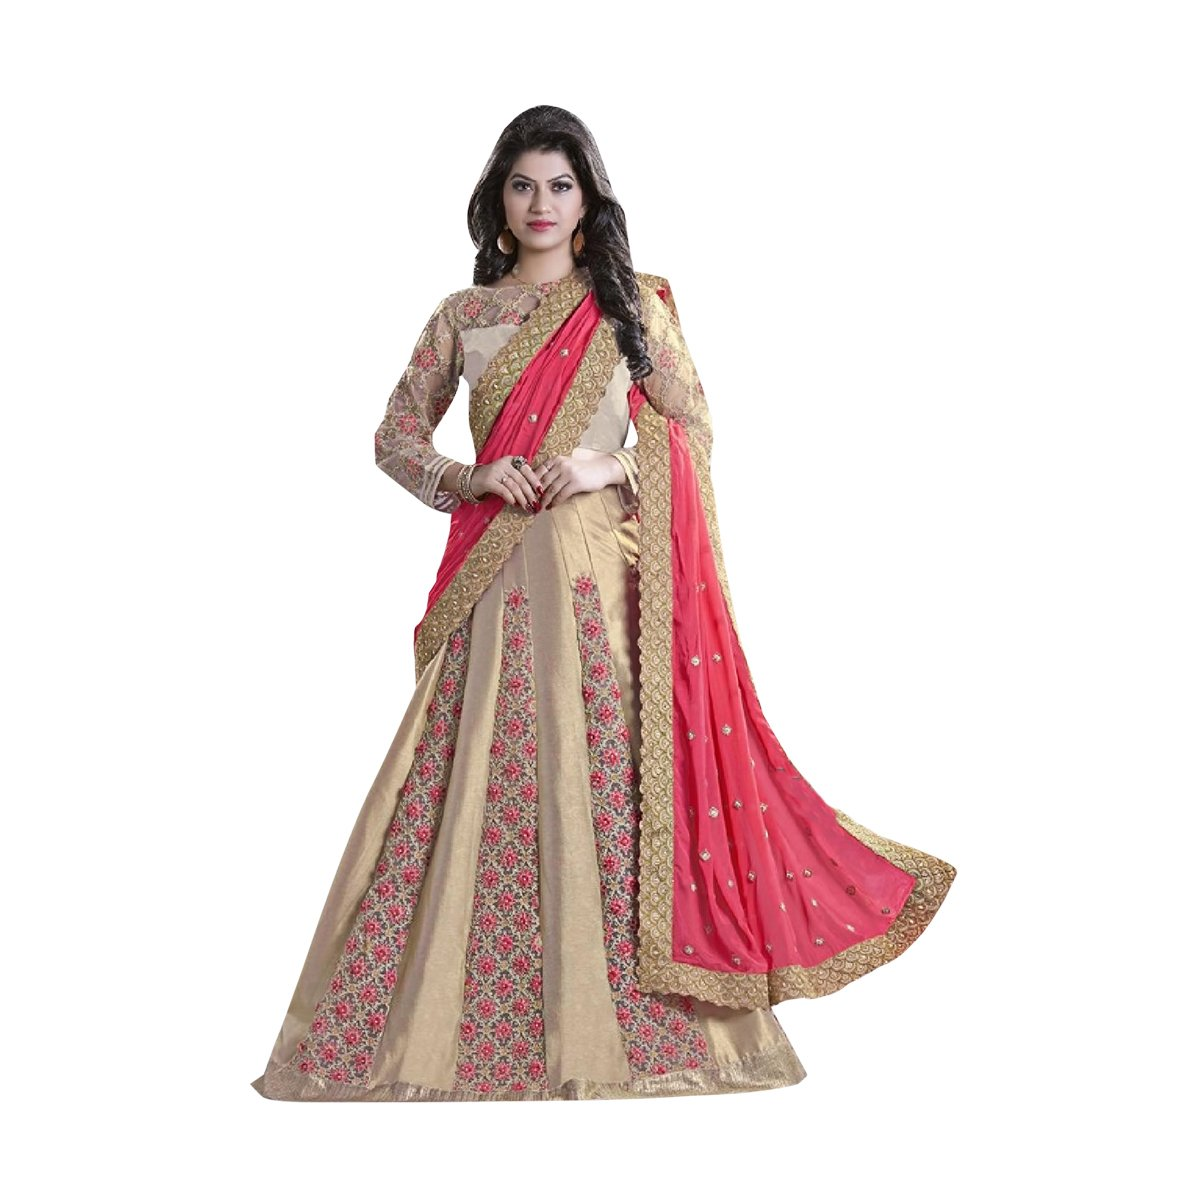 Bollywood Women Lehenga Choli Dupatta Ceremony Bridal Wedding Women Blouse Collection 617 24